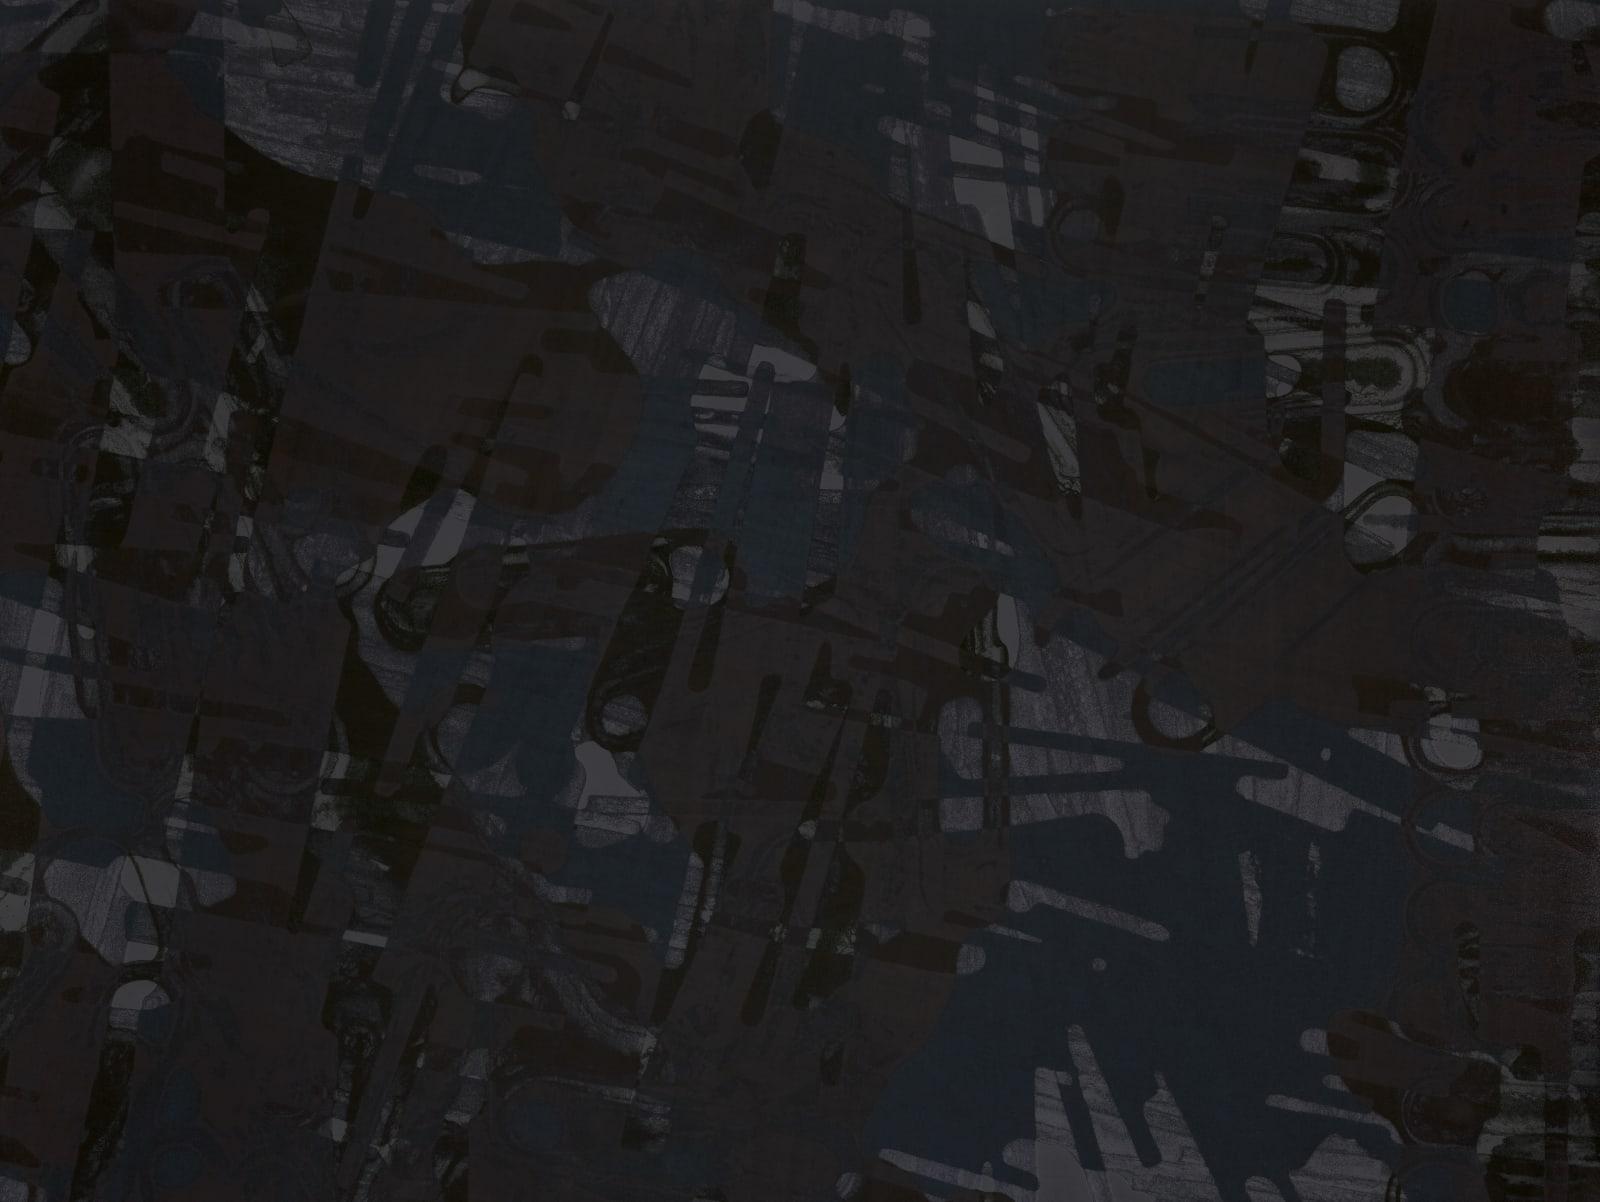 Kohei Nawa , Element Black #4, 2018